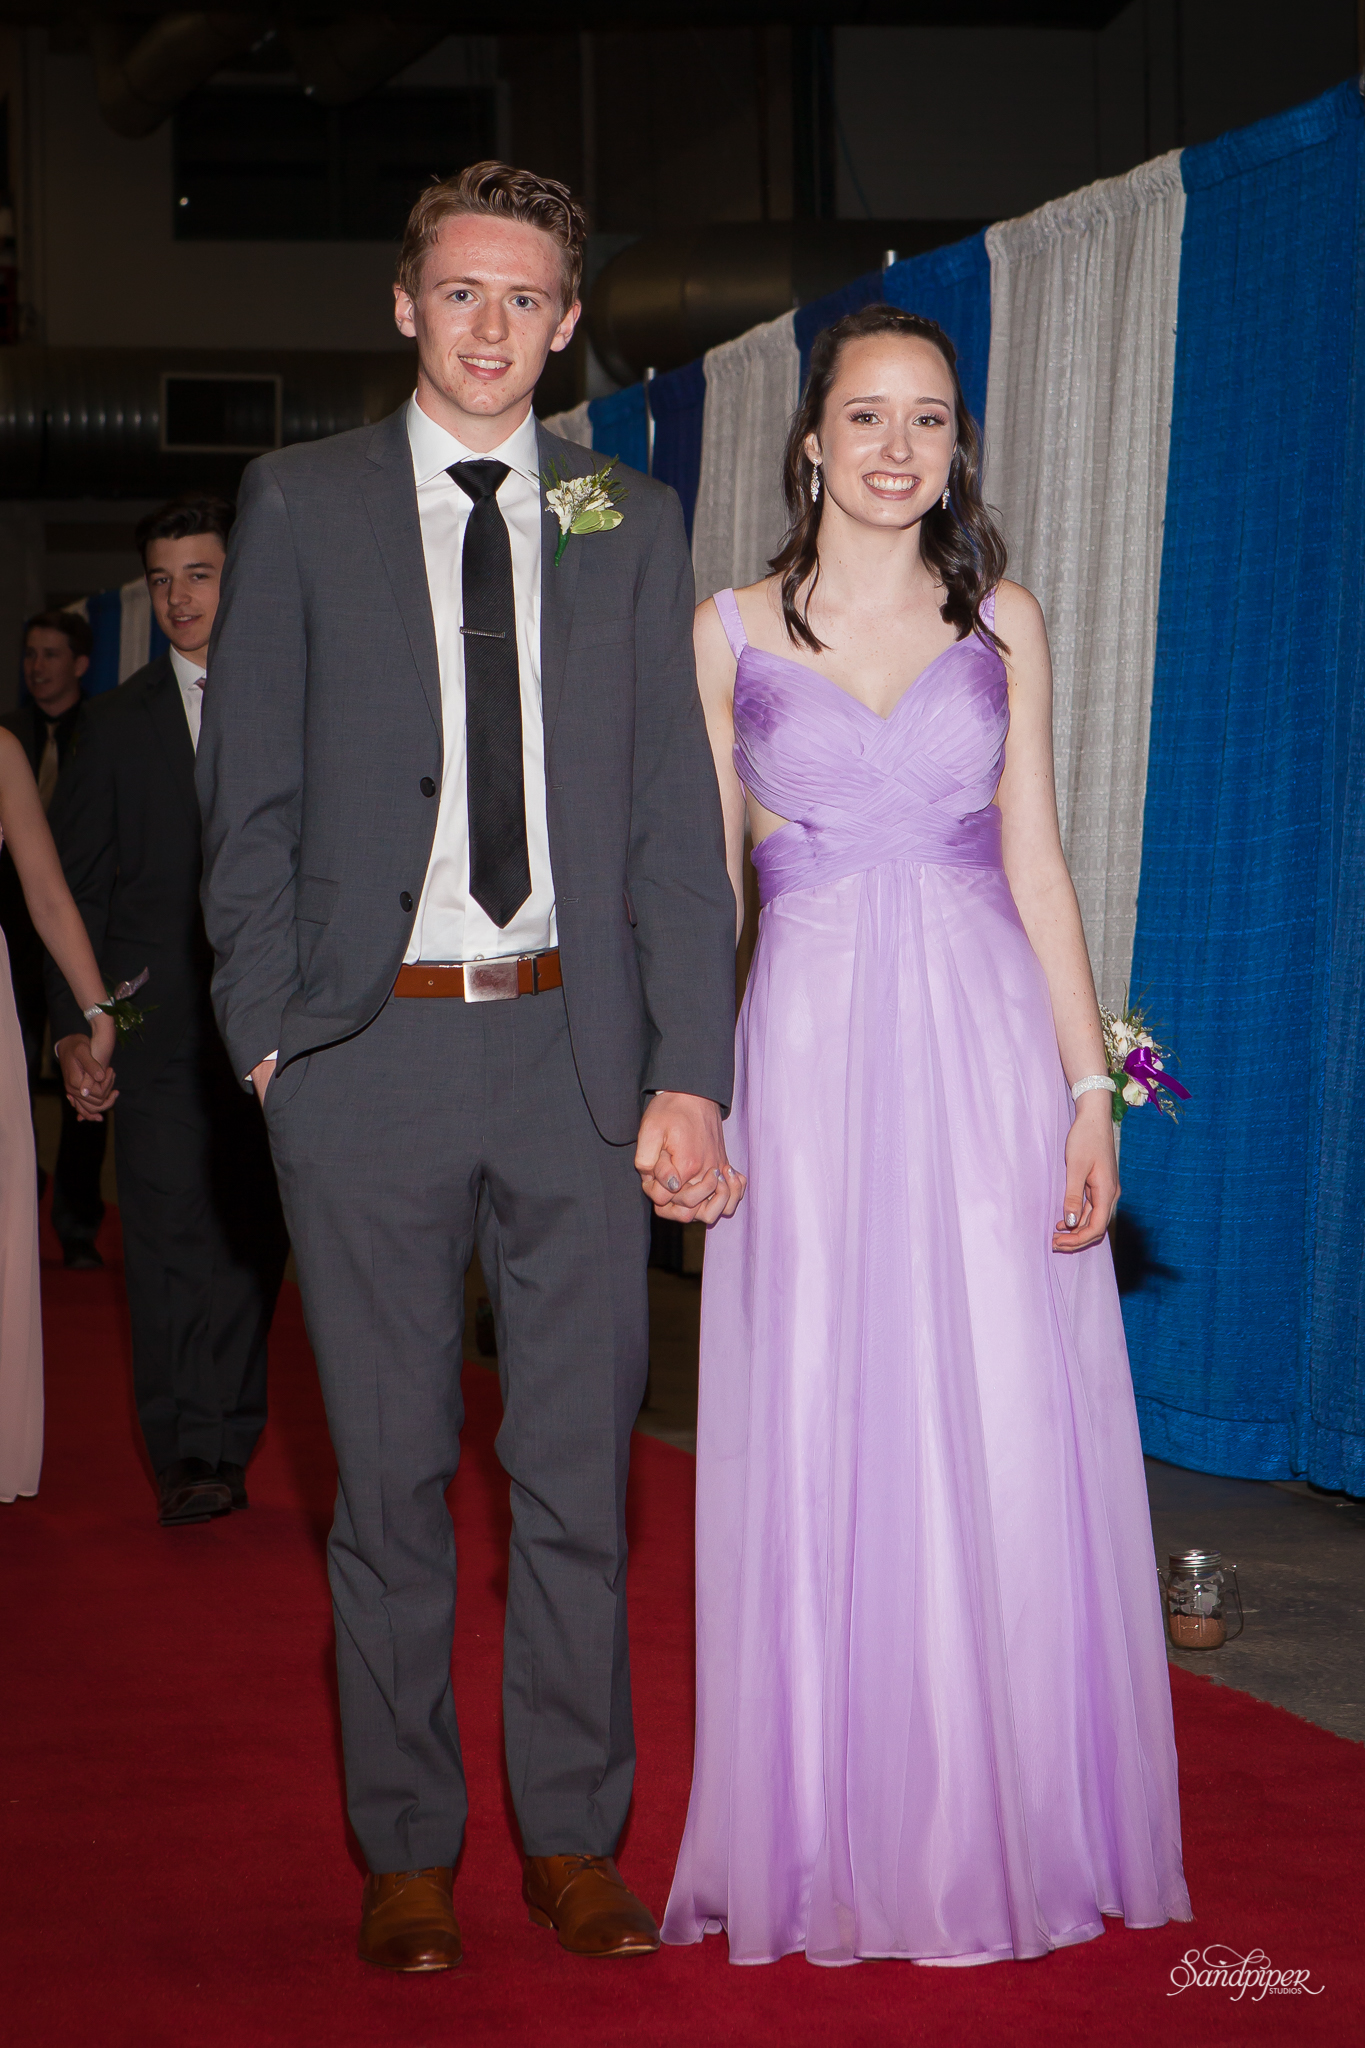 Bluefield Prom 2017 64